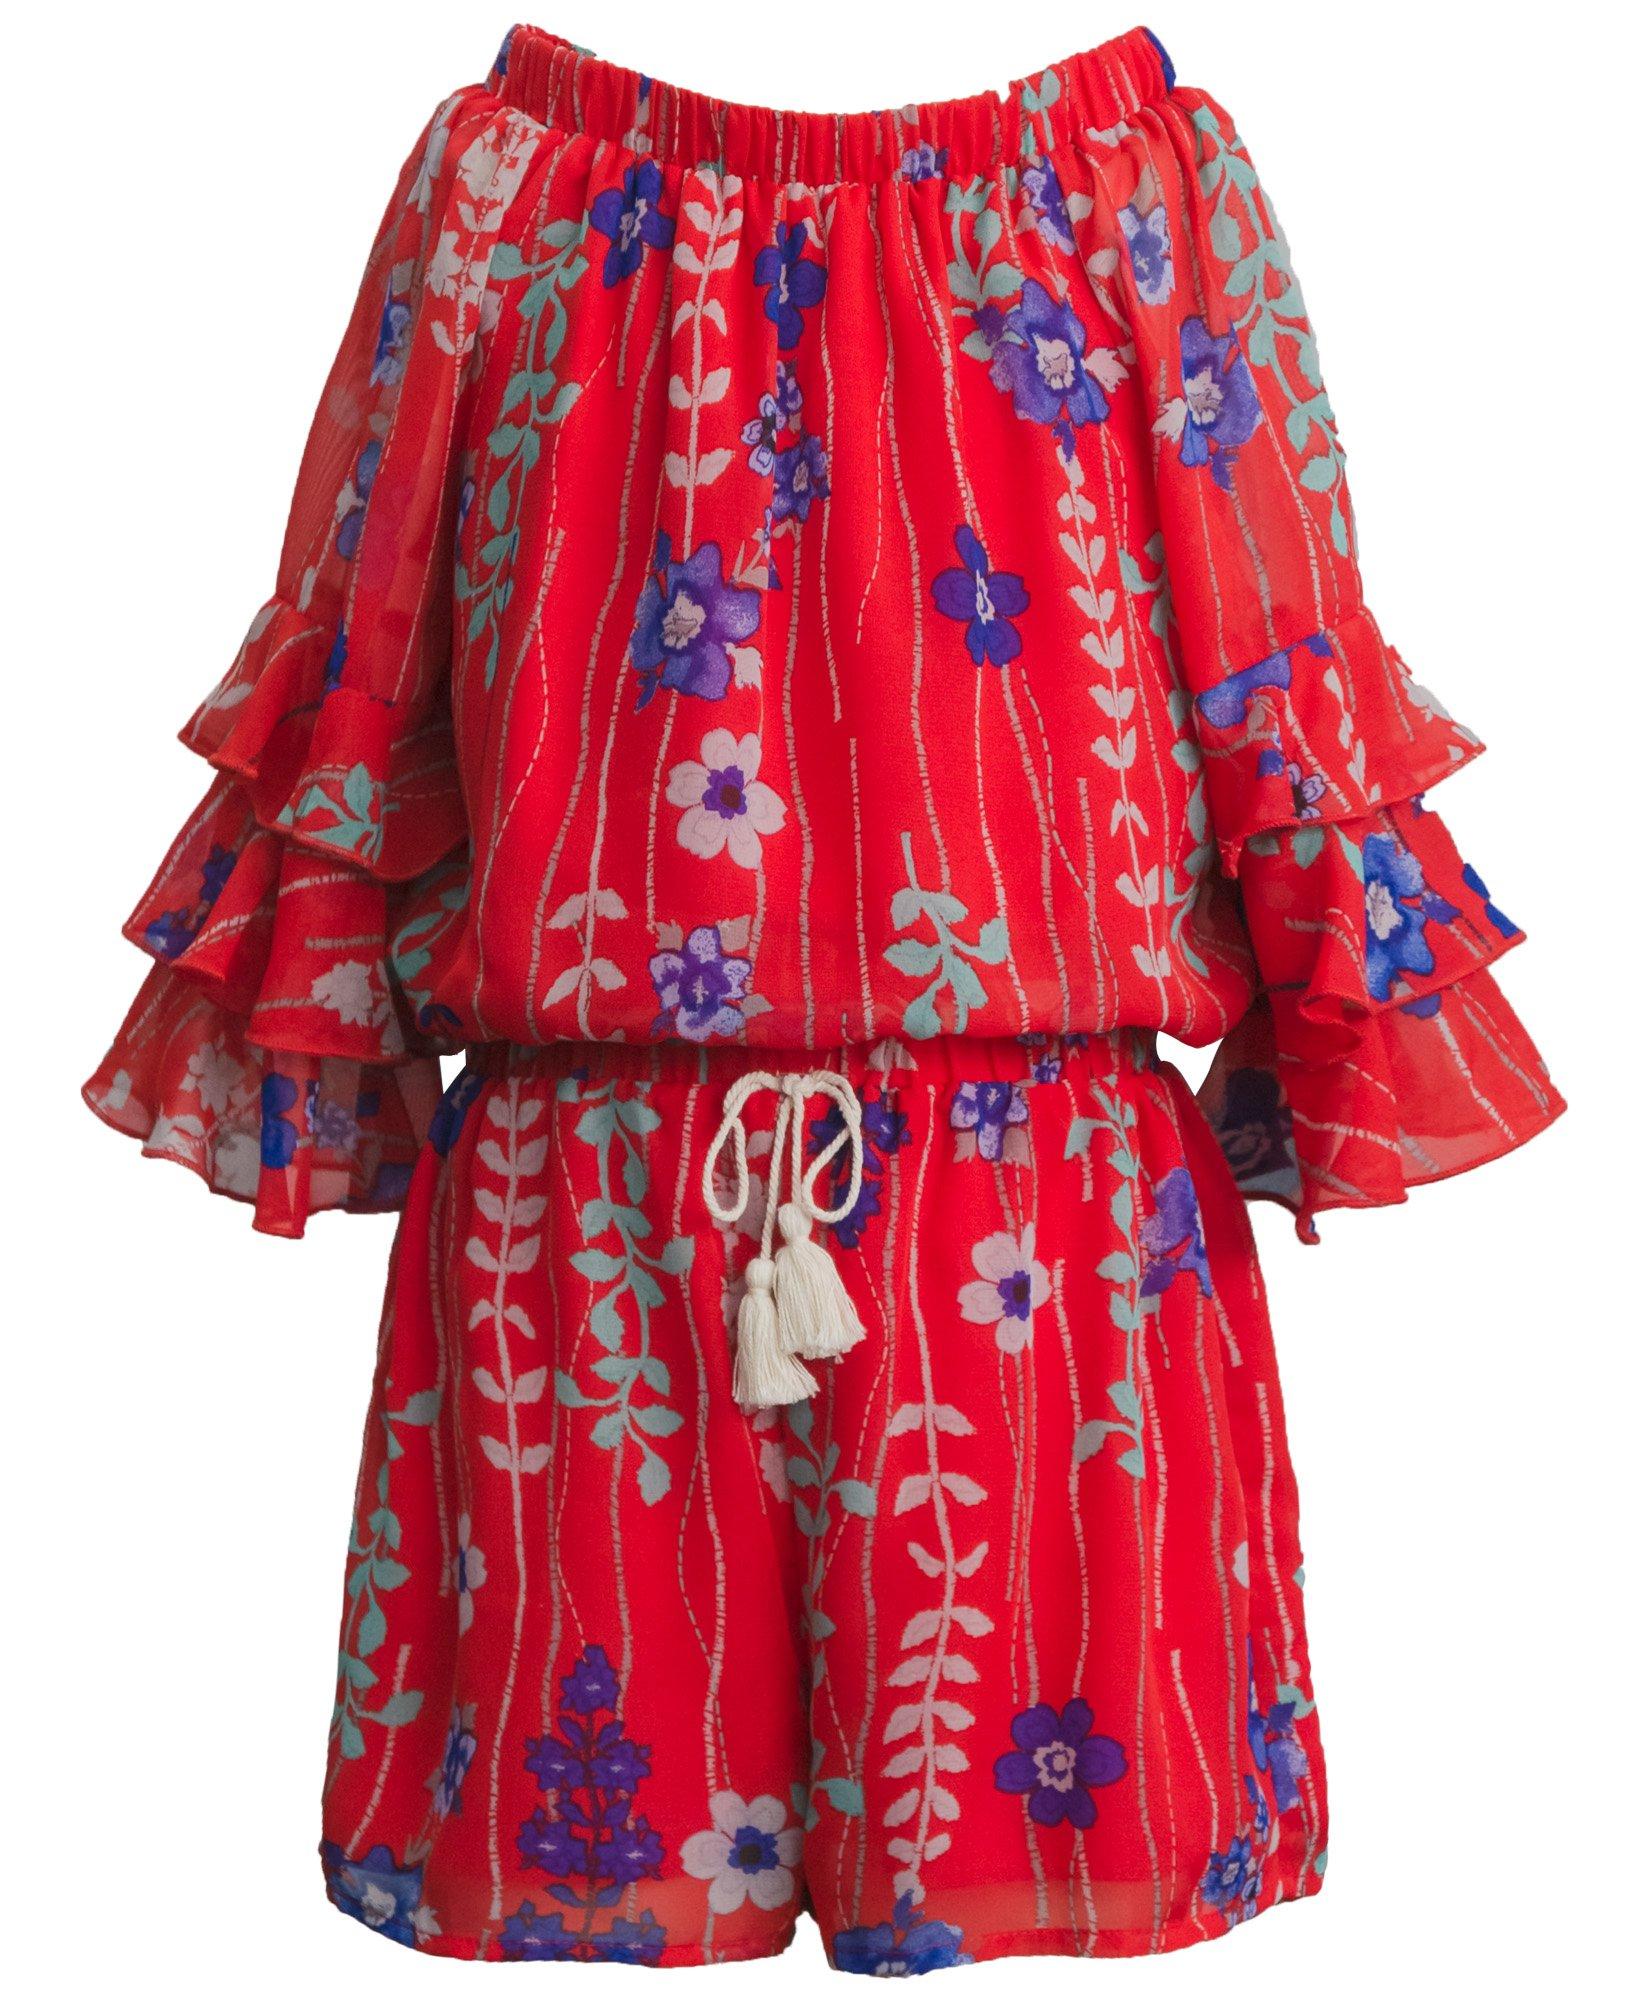 Truly Me, Big Girls Tween Gorgeous Chiffon Romper (Many Options), 7-16 (8, Red Multi)